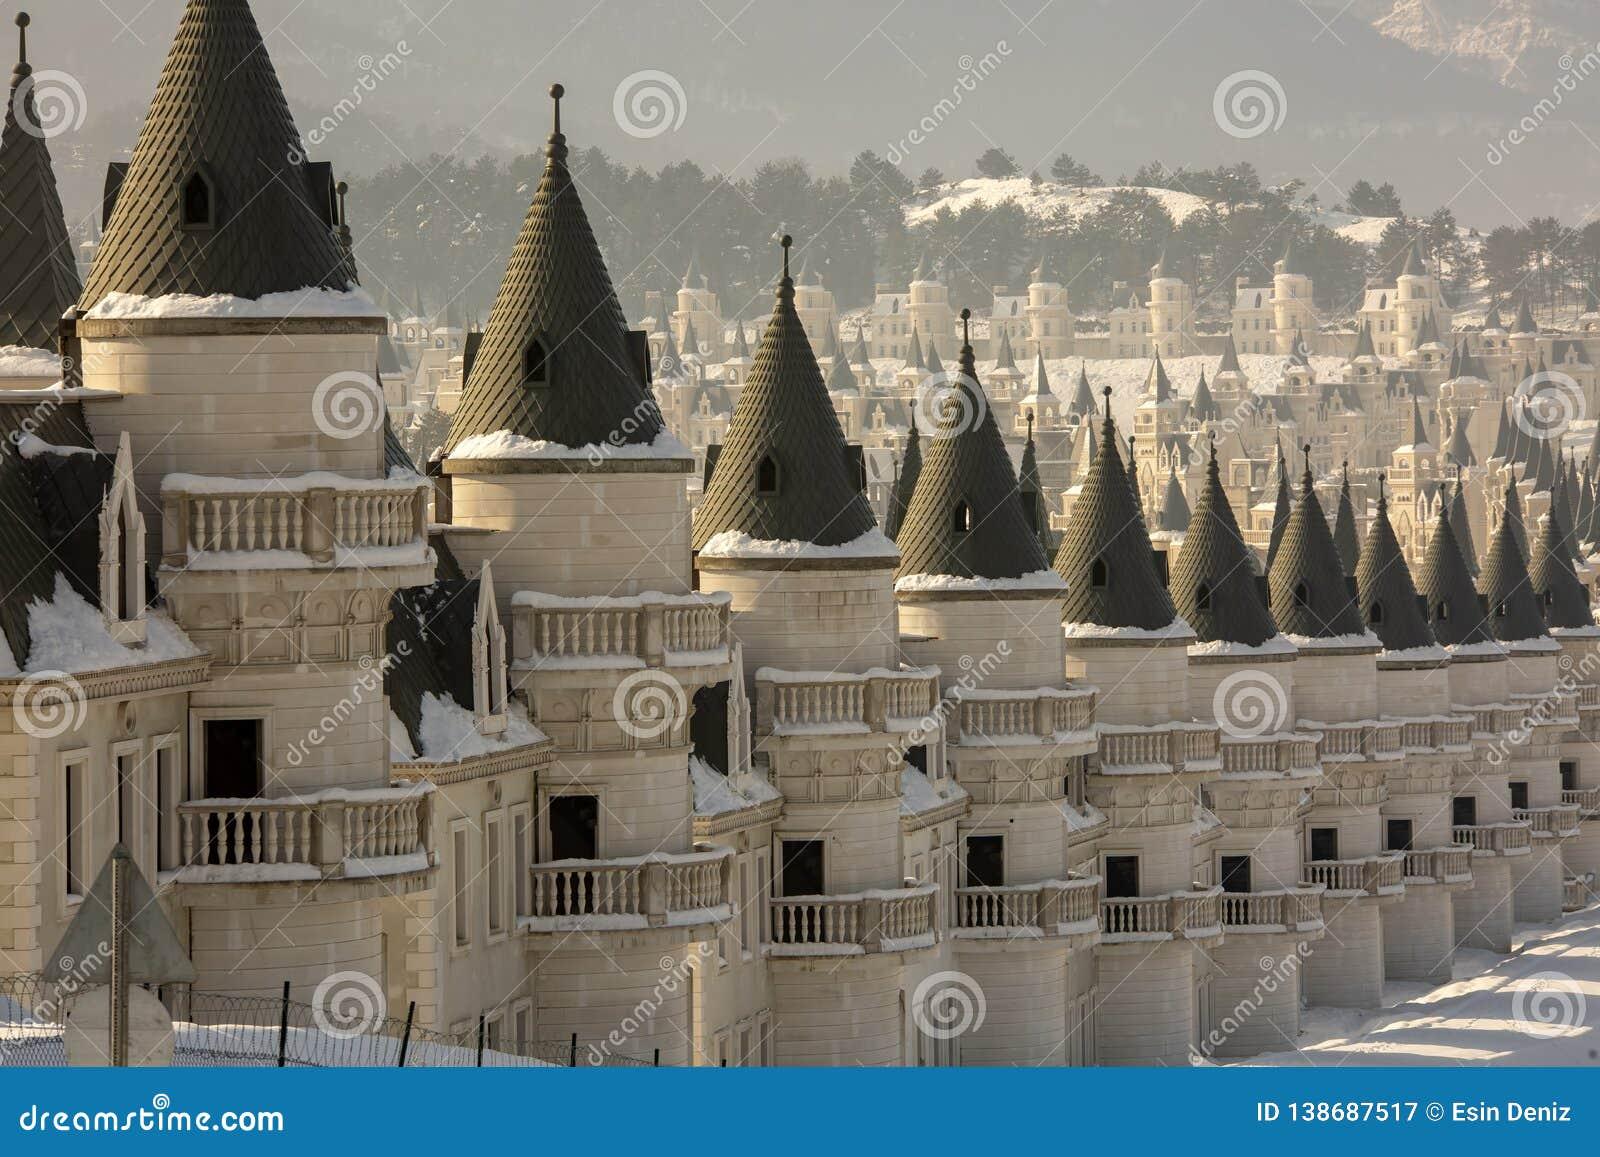 Mudurnu / Bolu / Turkey, 18 January, 2019, Chateau Houses, Burj Al Babas  Editorial Photography - Image of european, season: 138687517